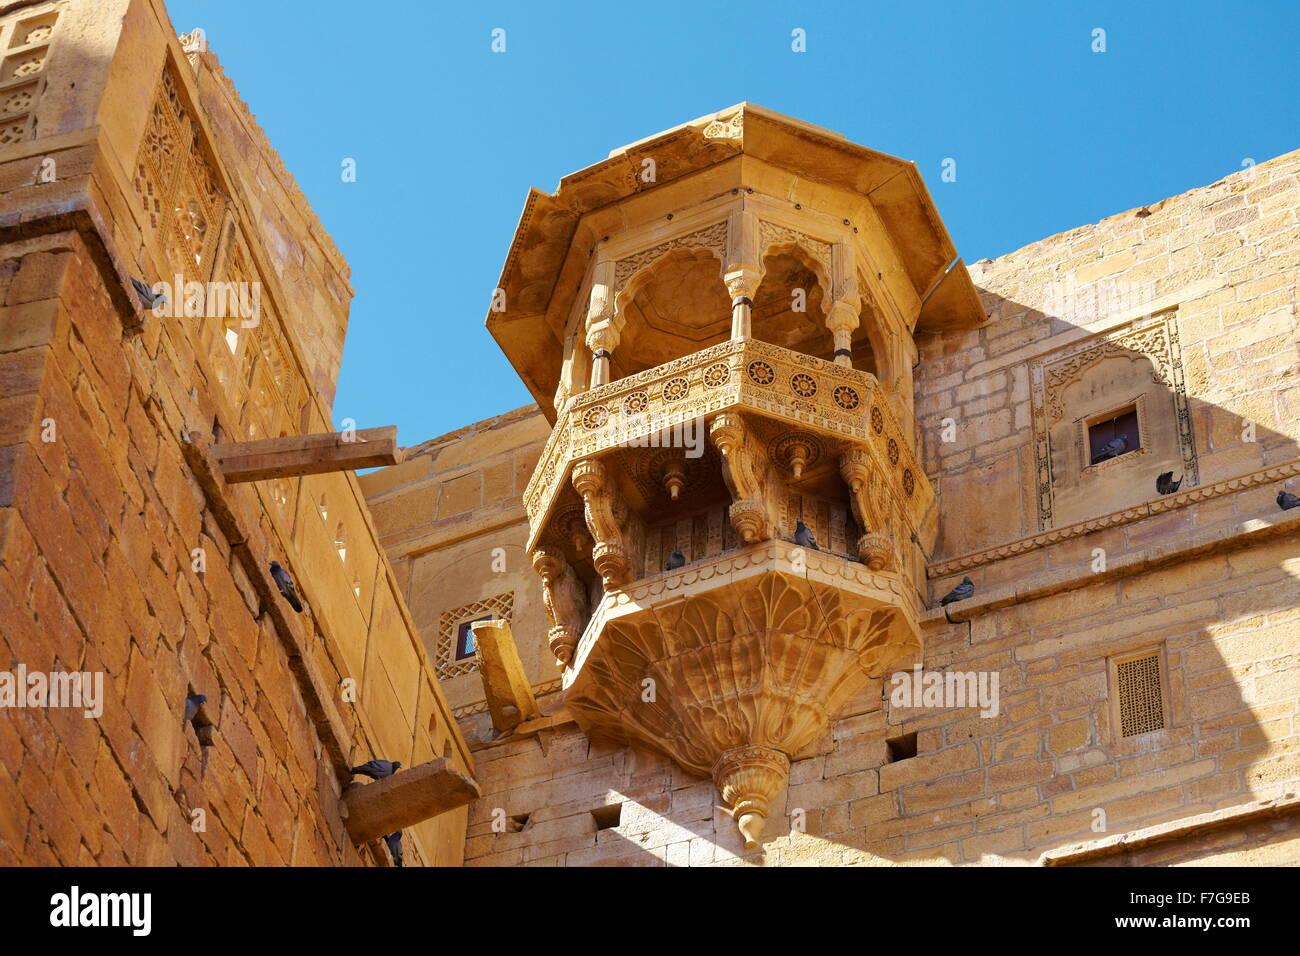 Ornate balcony in Jaisalmer Fort, architecture detail, Jaisalmer, Rajasthan, India - Stock Image